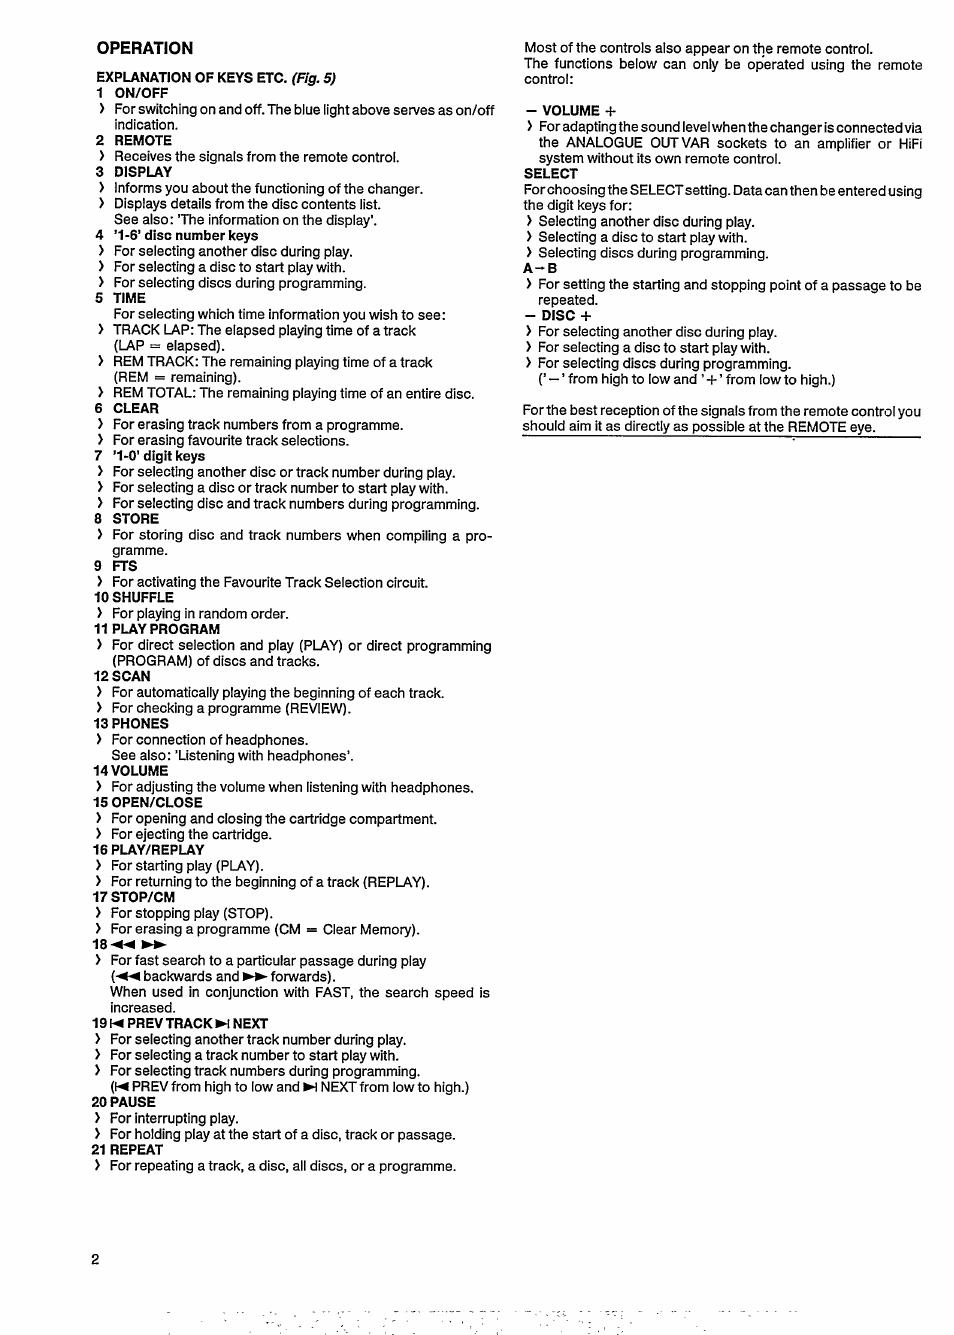 Operation, Explanation of keys etc. (fig. 5), 1 on/off